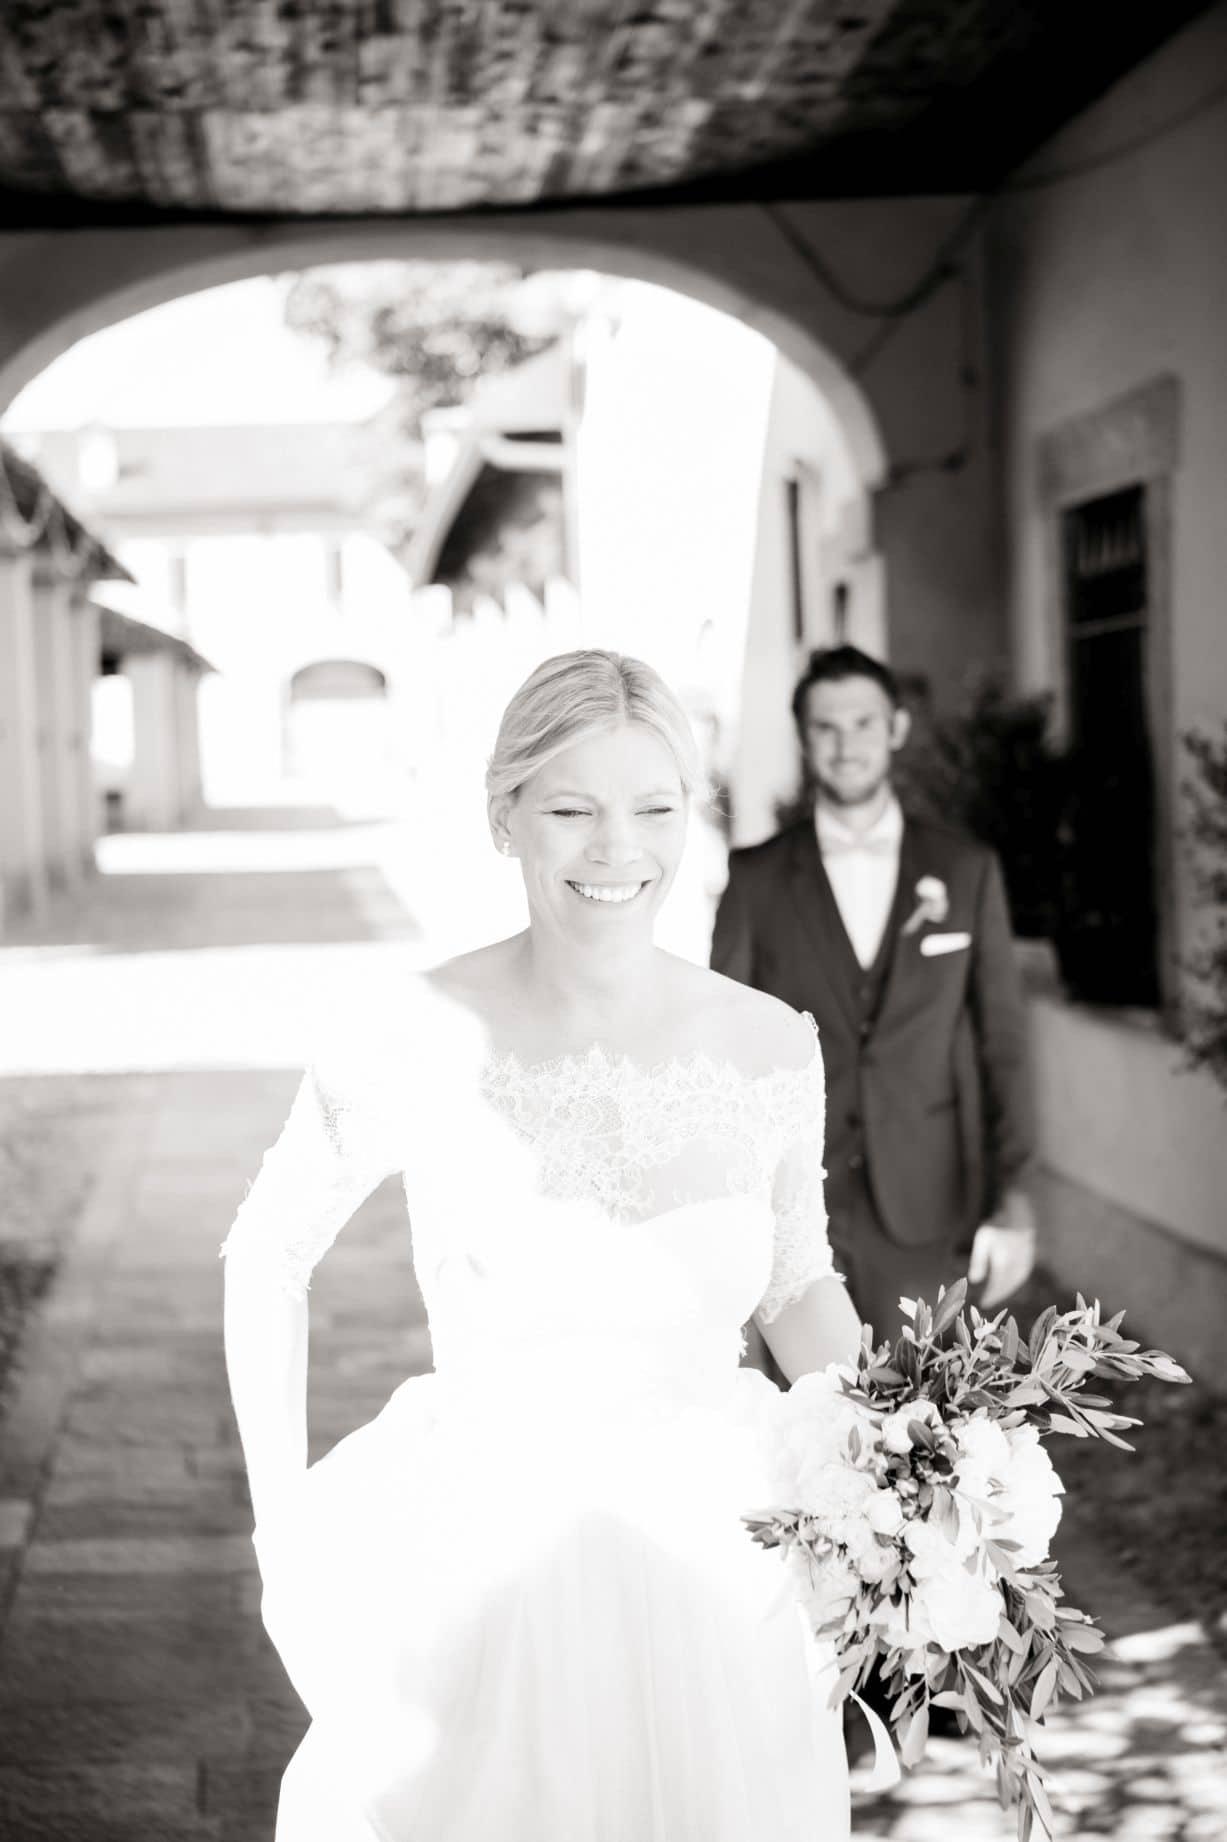 Million Memories_A&D_Hochzeitsfotograf_Schlosshochzeit_Toskana_Lago Di Como_Wedding_Tuscany_111